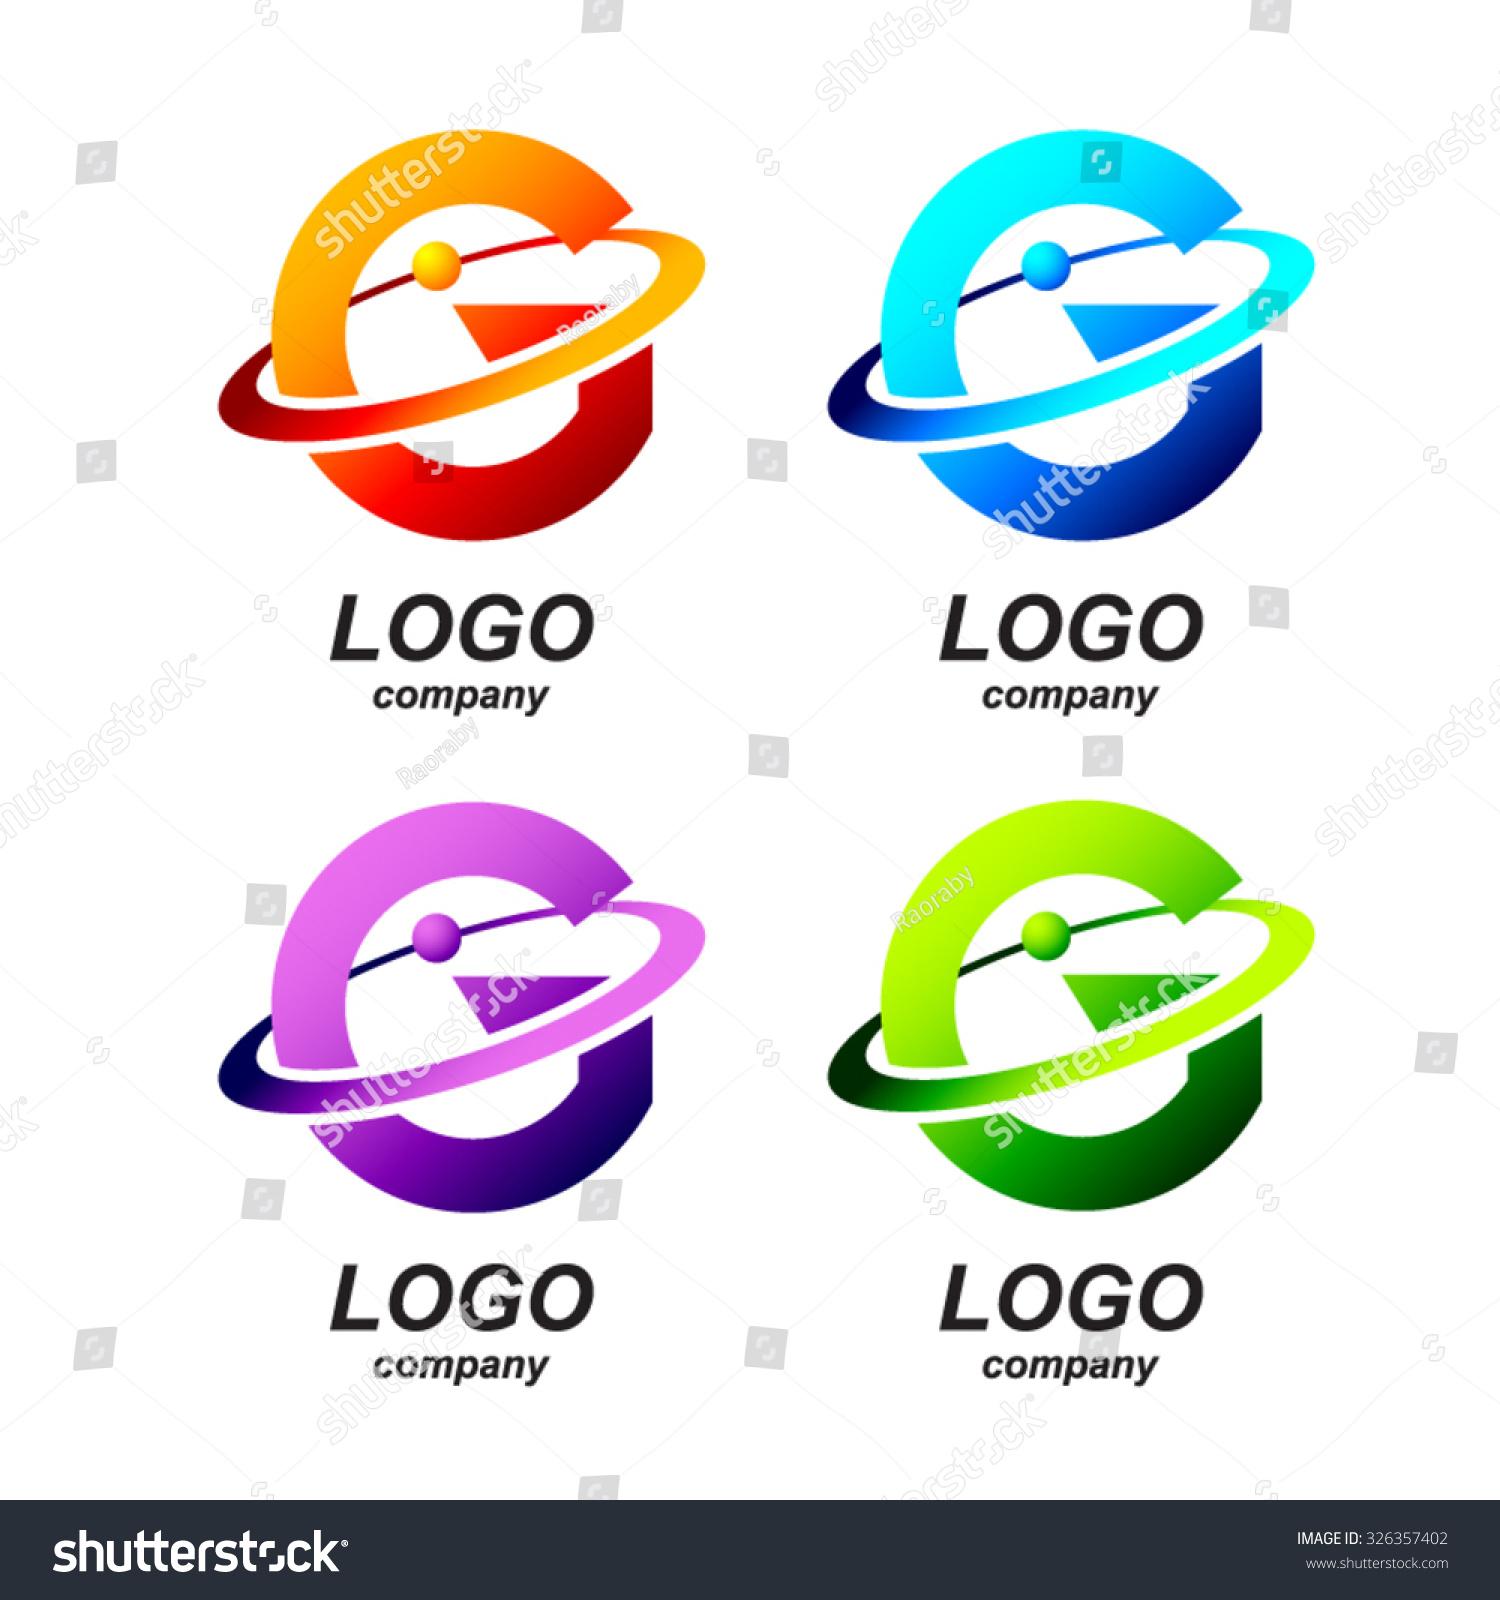 Free Organization Logo Design  Free Logo Design for download